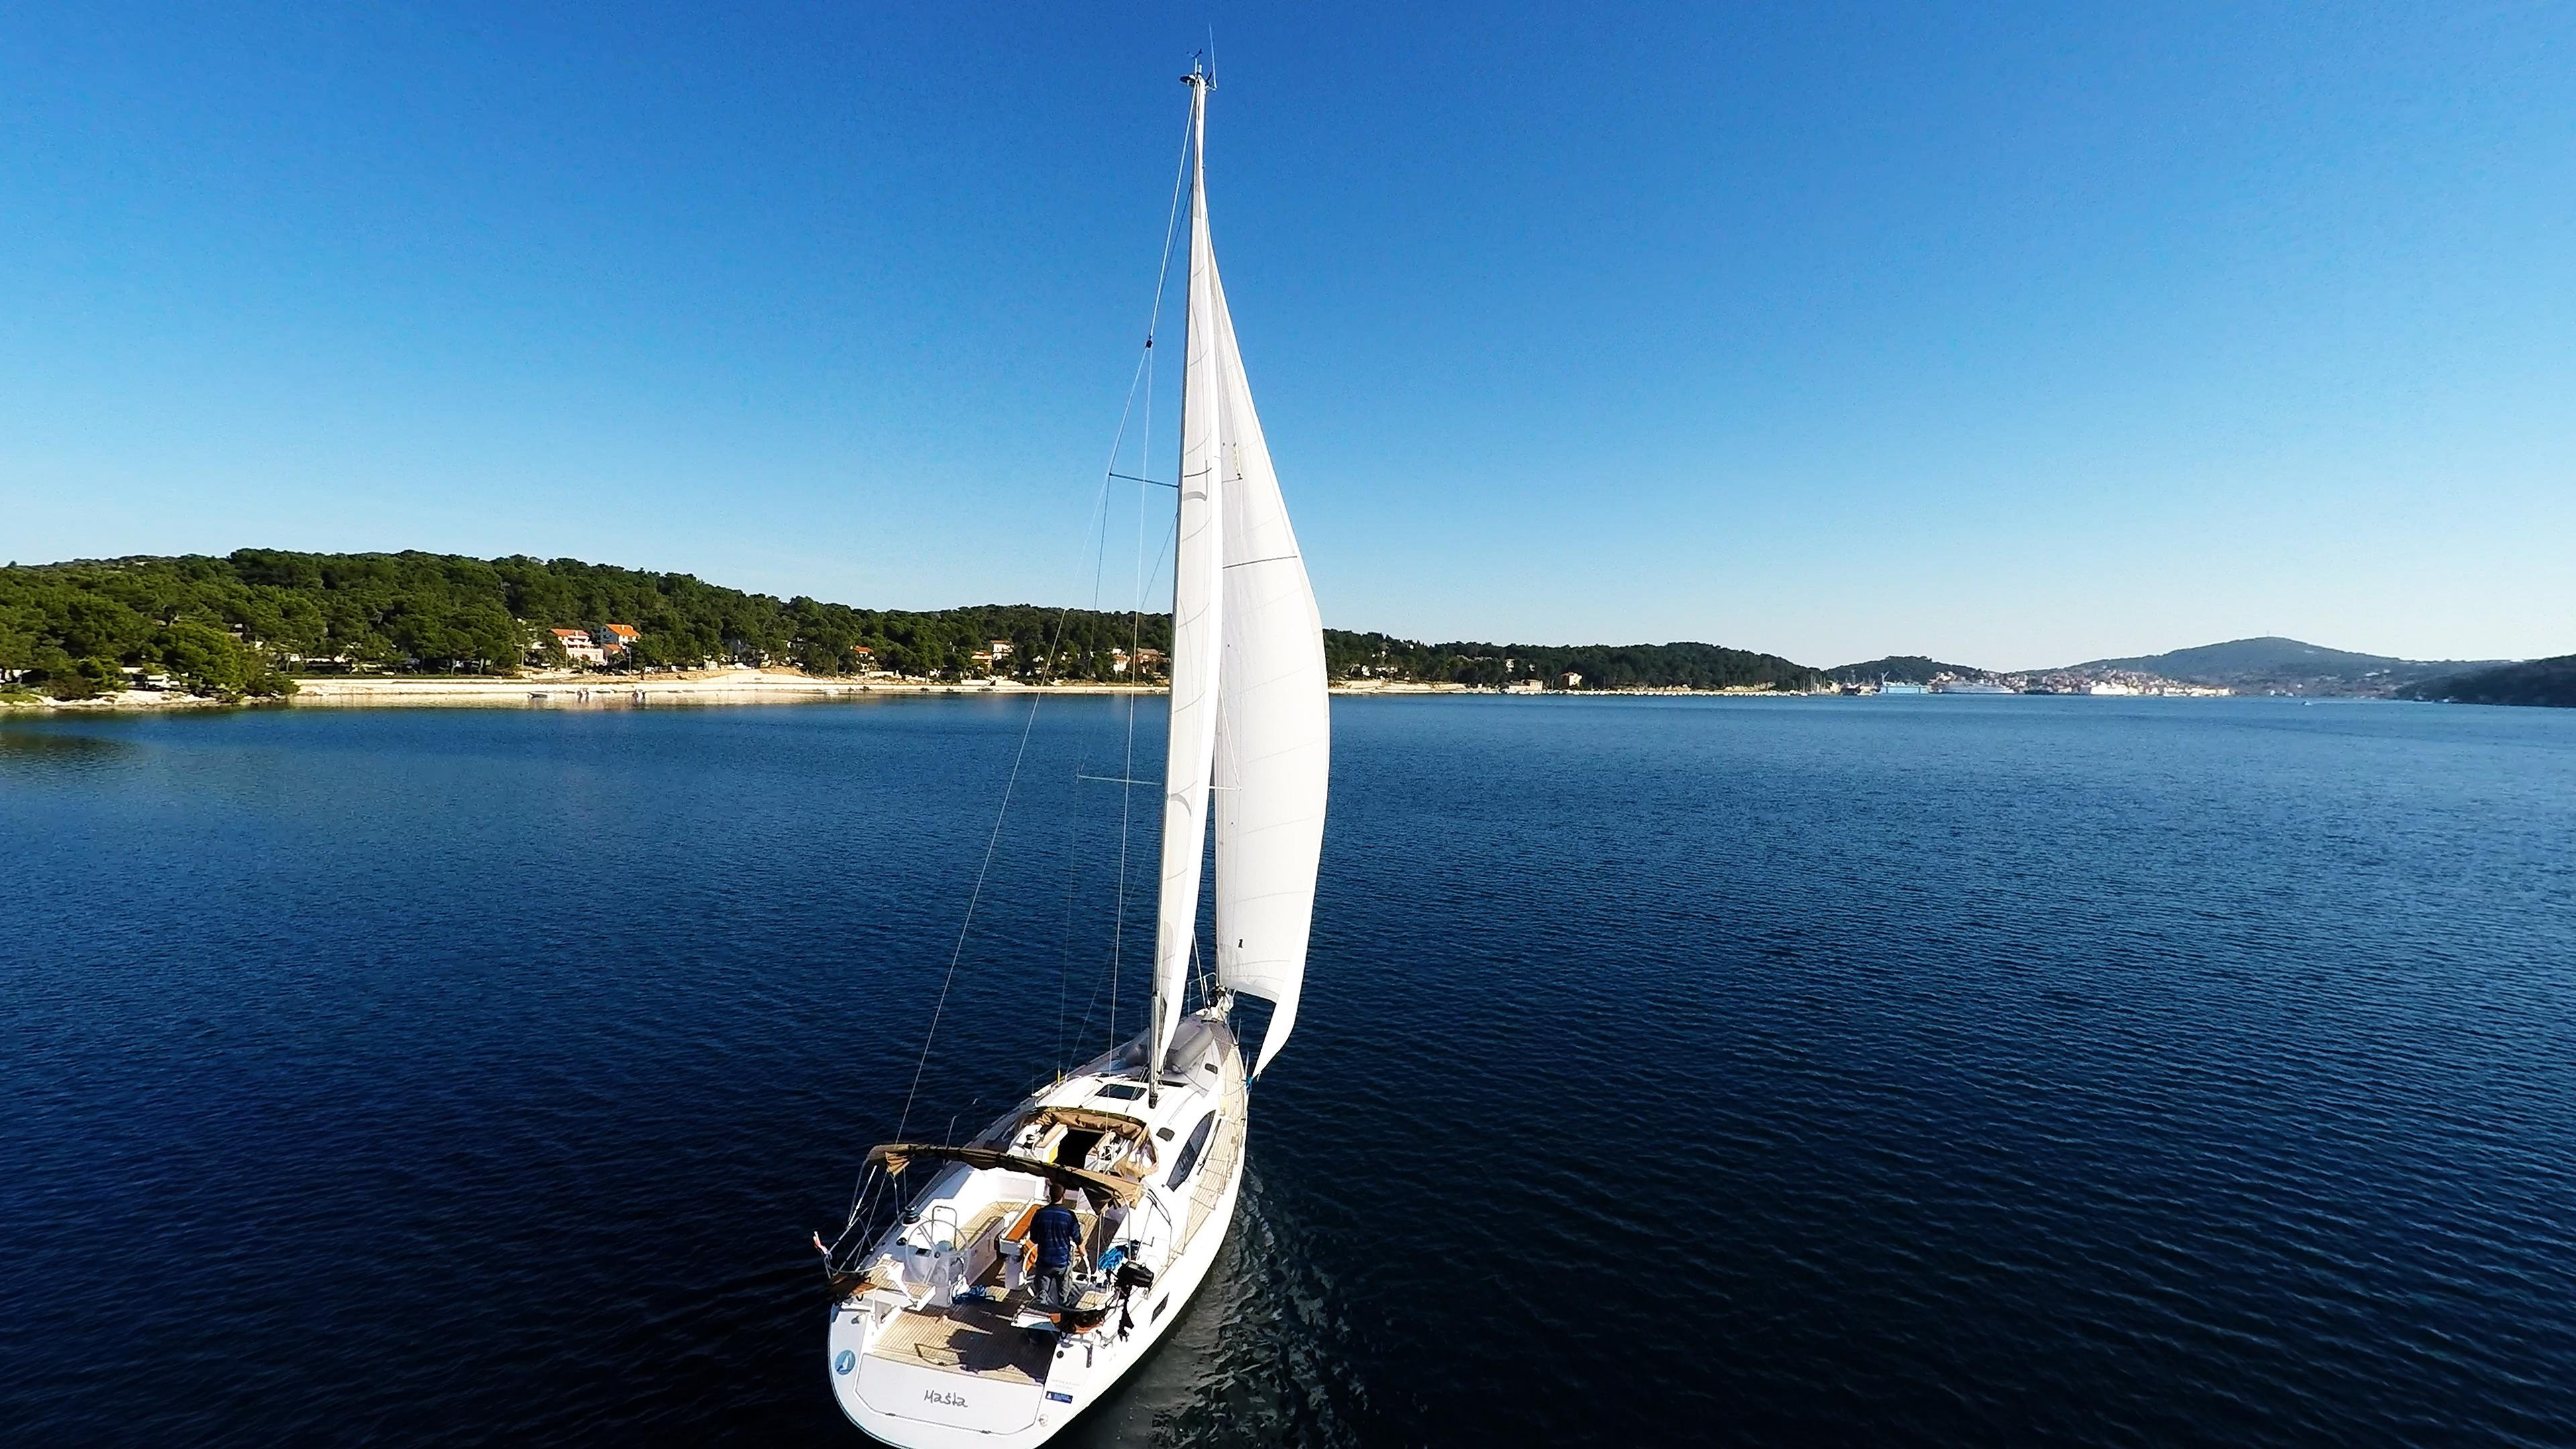 barcha a vela vele di yacht a vela baia del mare cielo blu barca a vela vela